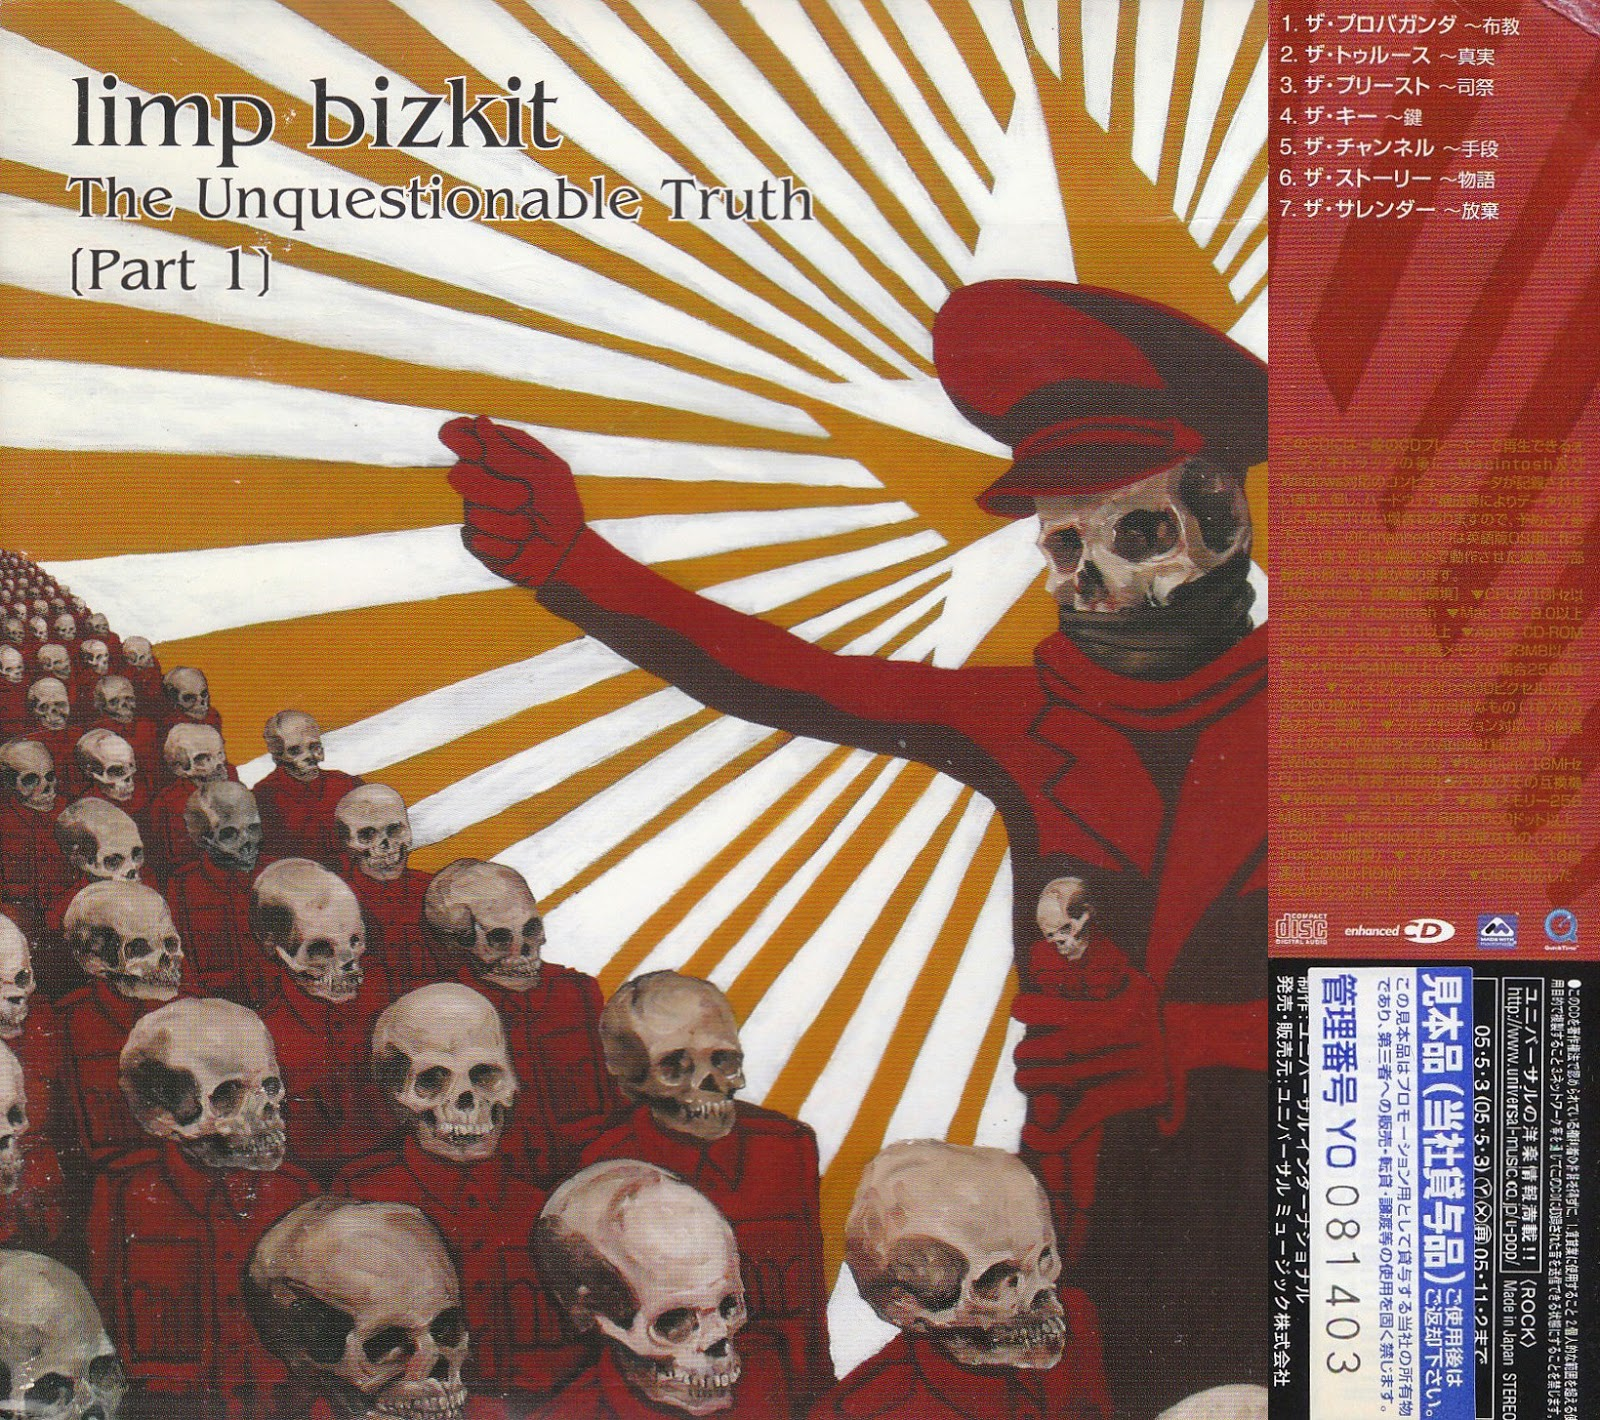 Discografia Limp Bizkit 320 Kbps MEGA - LaTornamesa